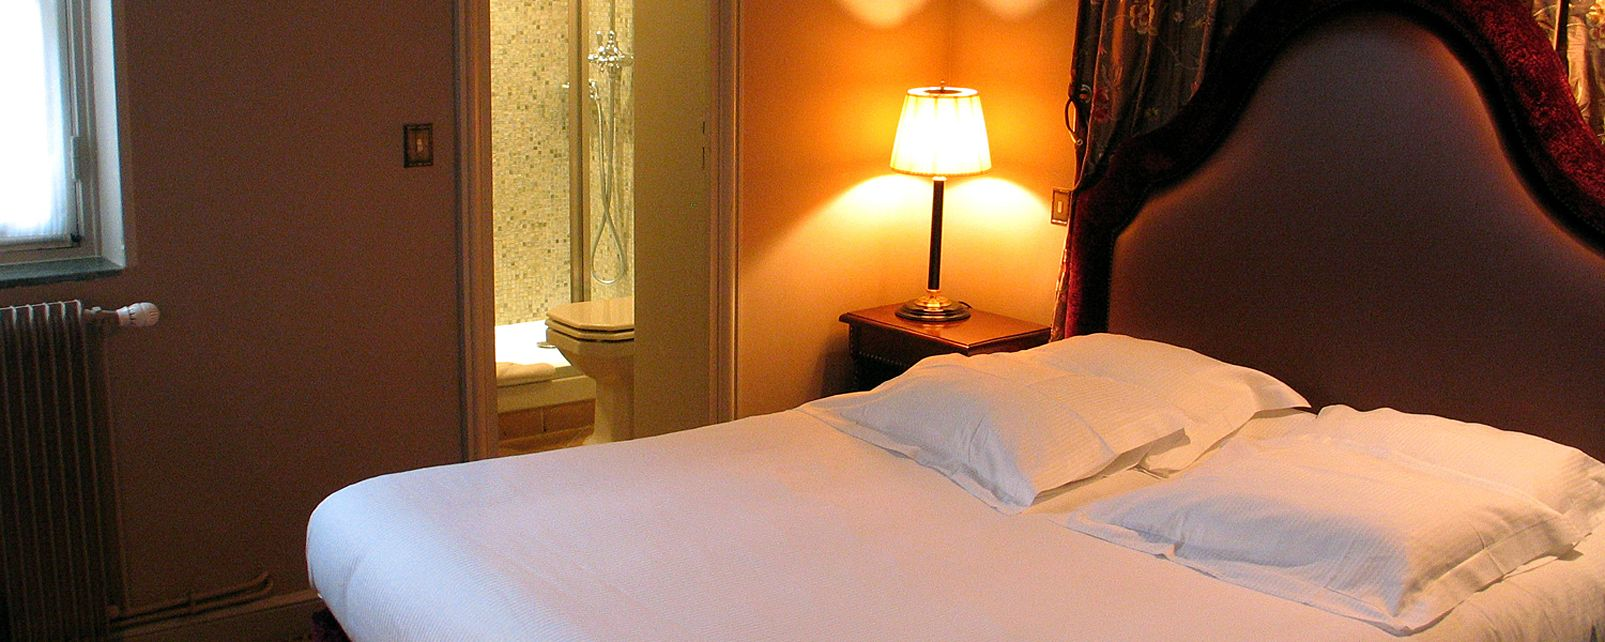 Hotel Odeon St Germain